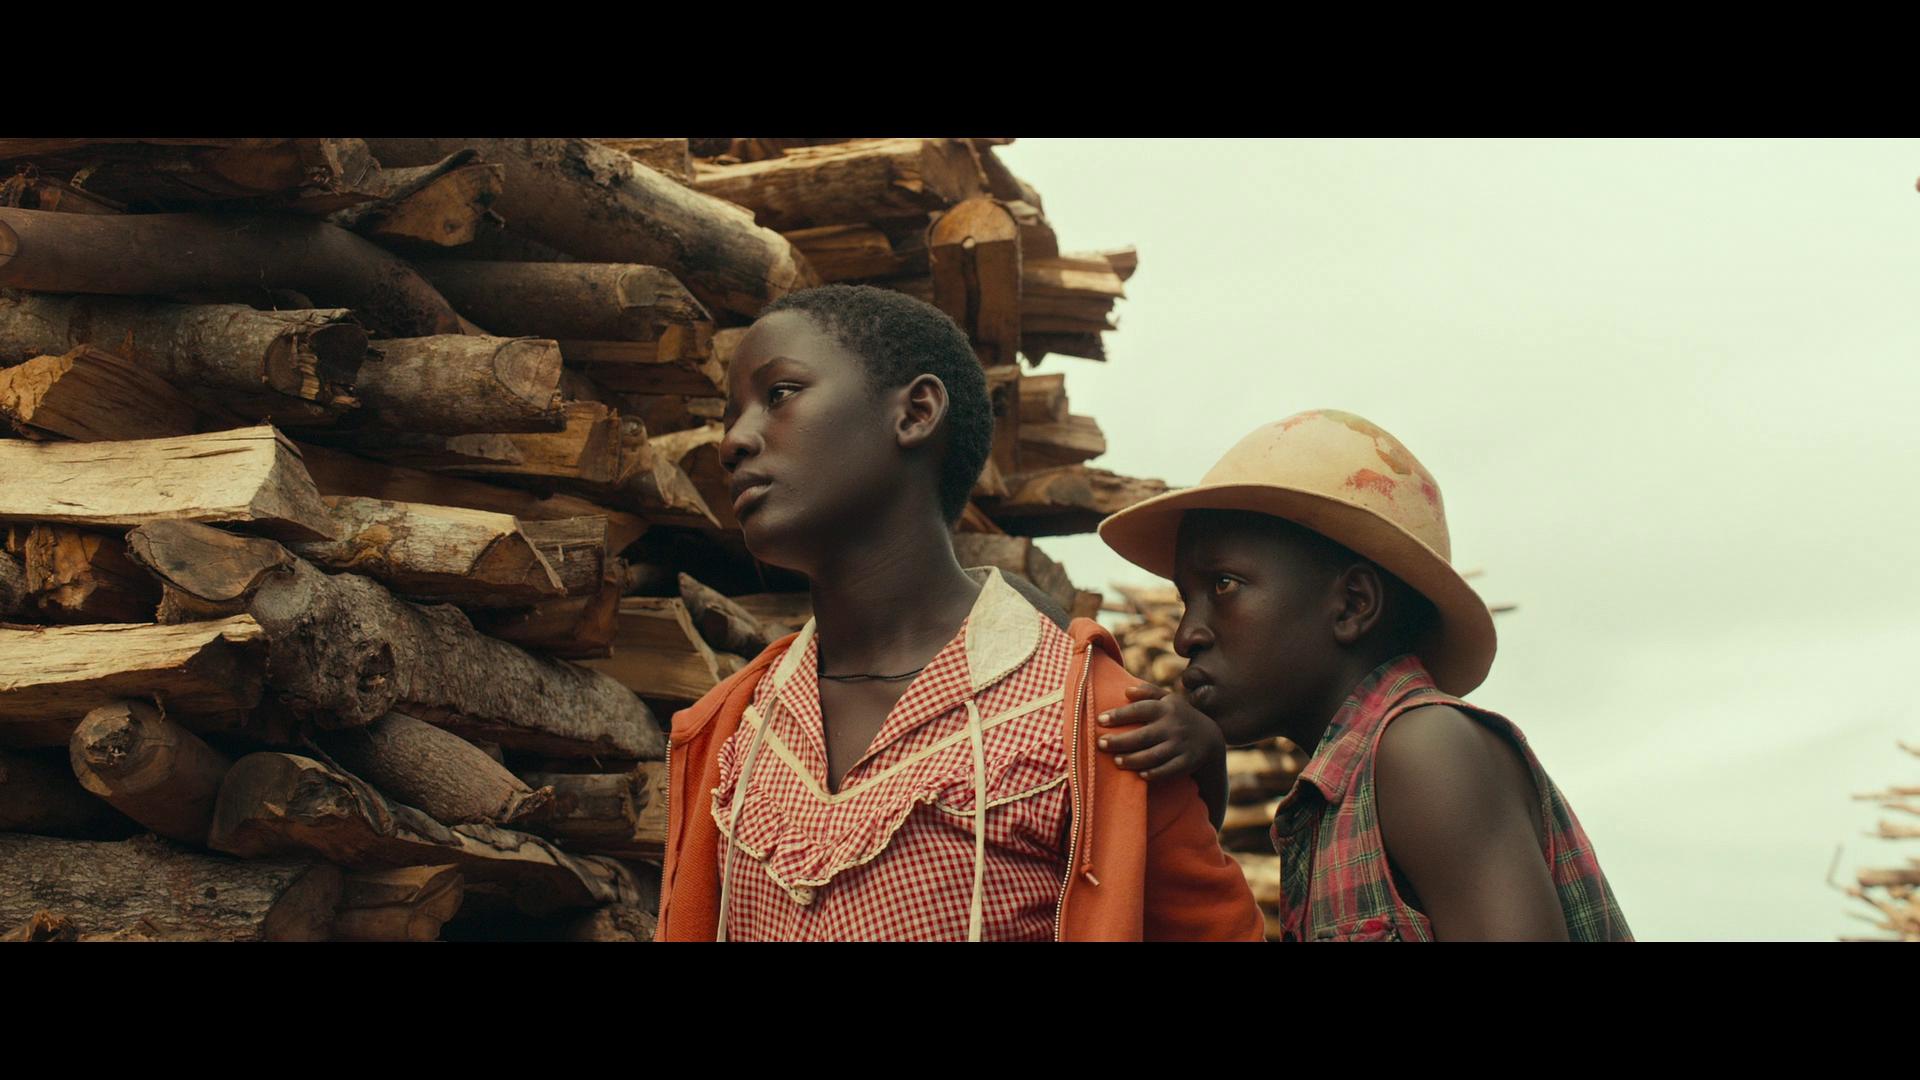 La reina de Katwe (2016) 1080p BRrip Latino